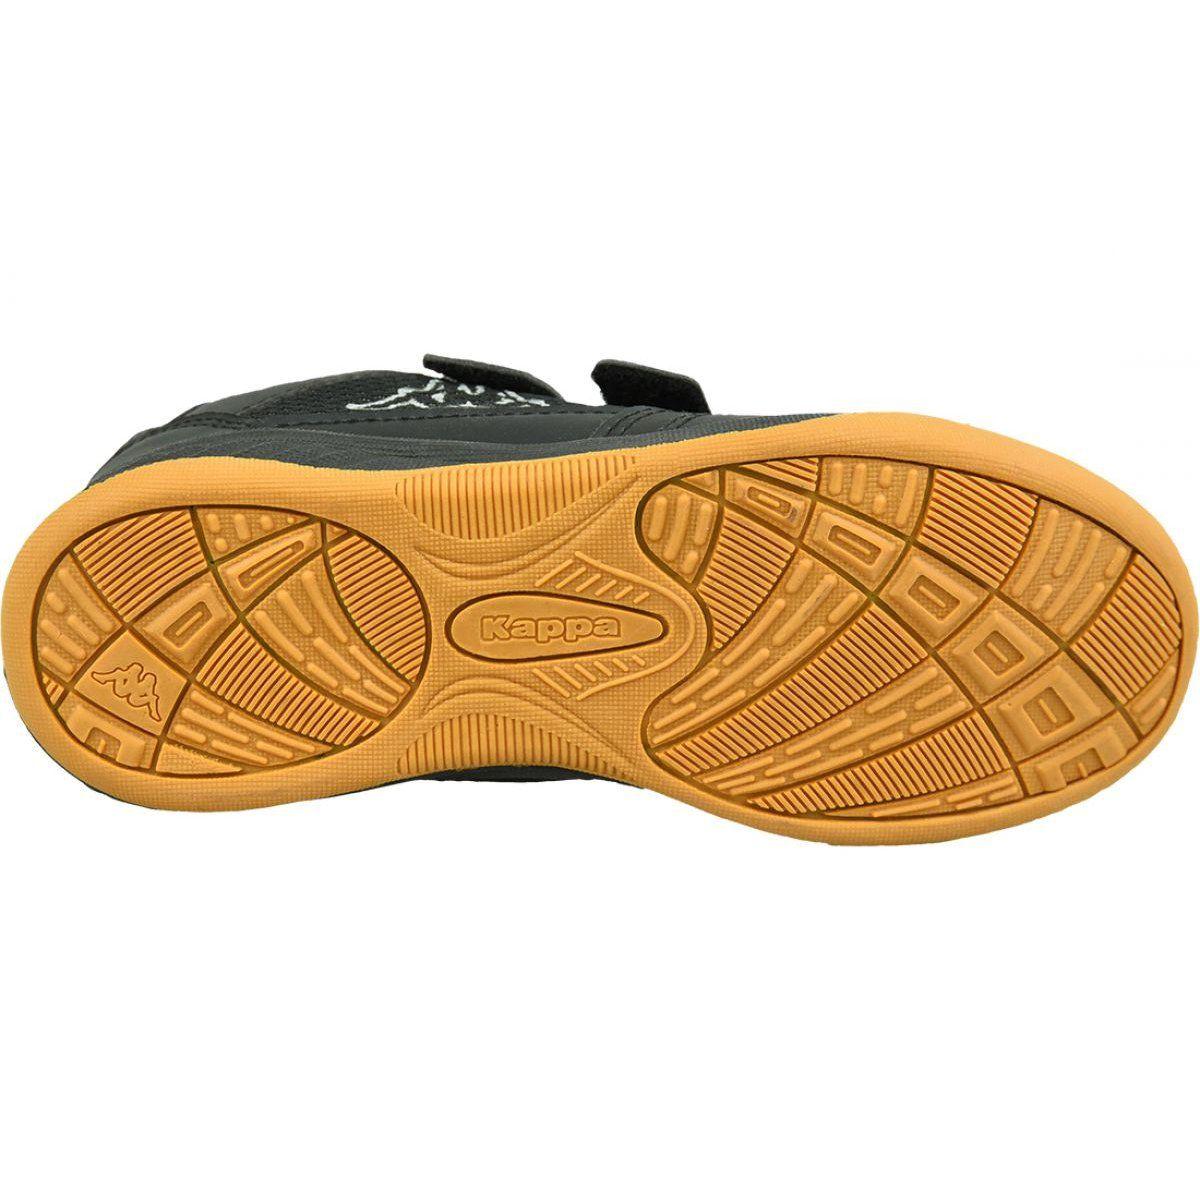 Kappa Kickoff K Jr 260509k 1116 Shoes Black Black Sports Shoes Kid Shoes Black Shoes